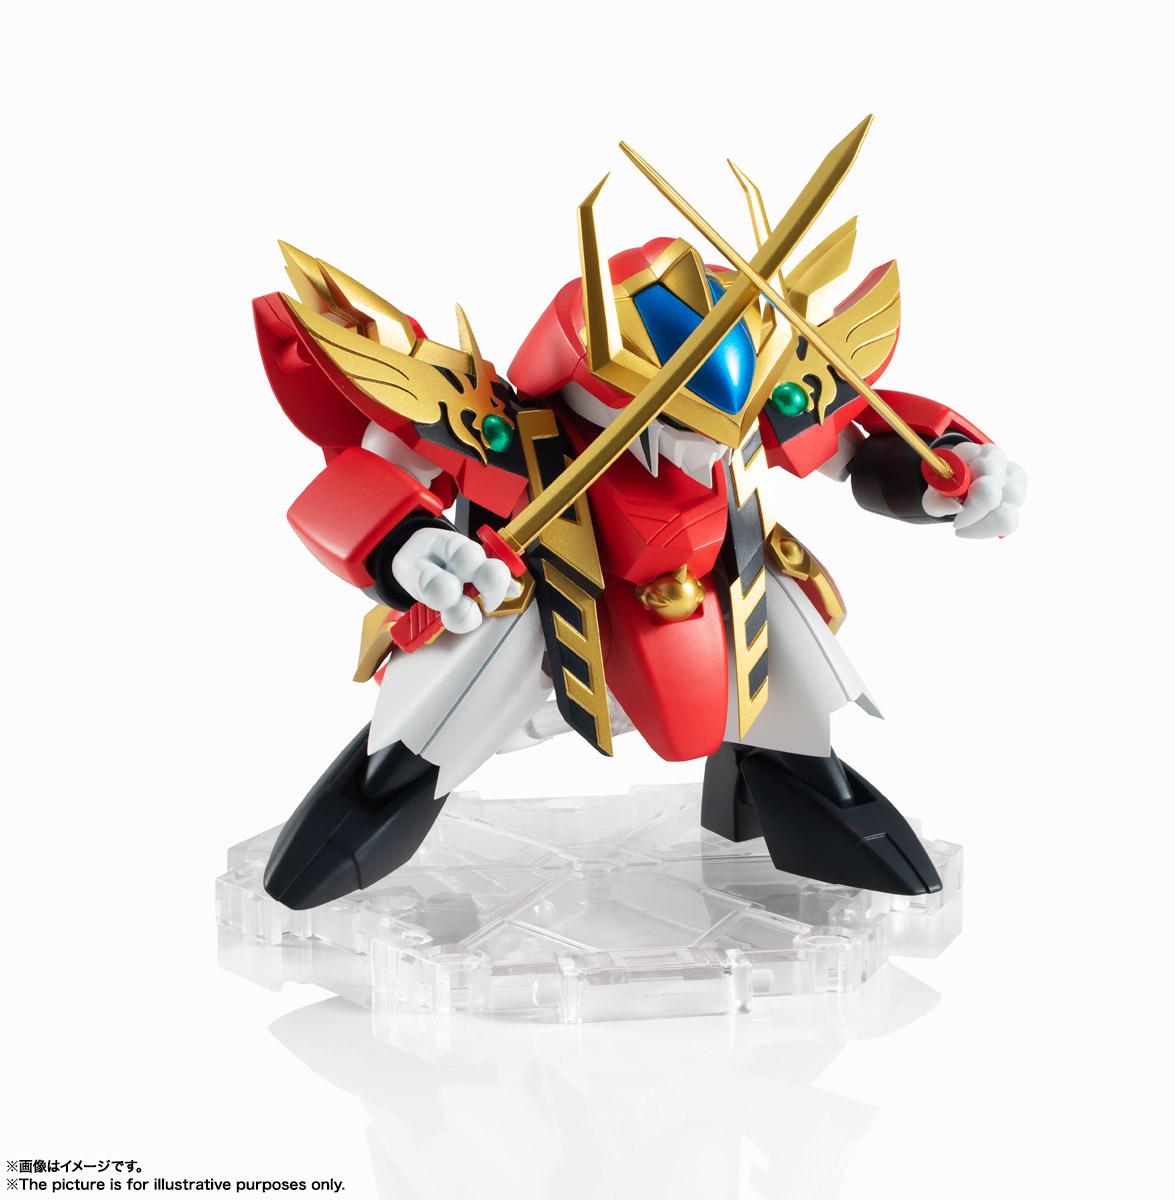 NXEDGE STYLE[MASHIN UNIT]『龍戦丸』魔神英雄伝ワタル 可動フィギュア-001